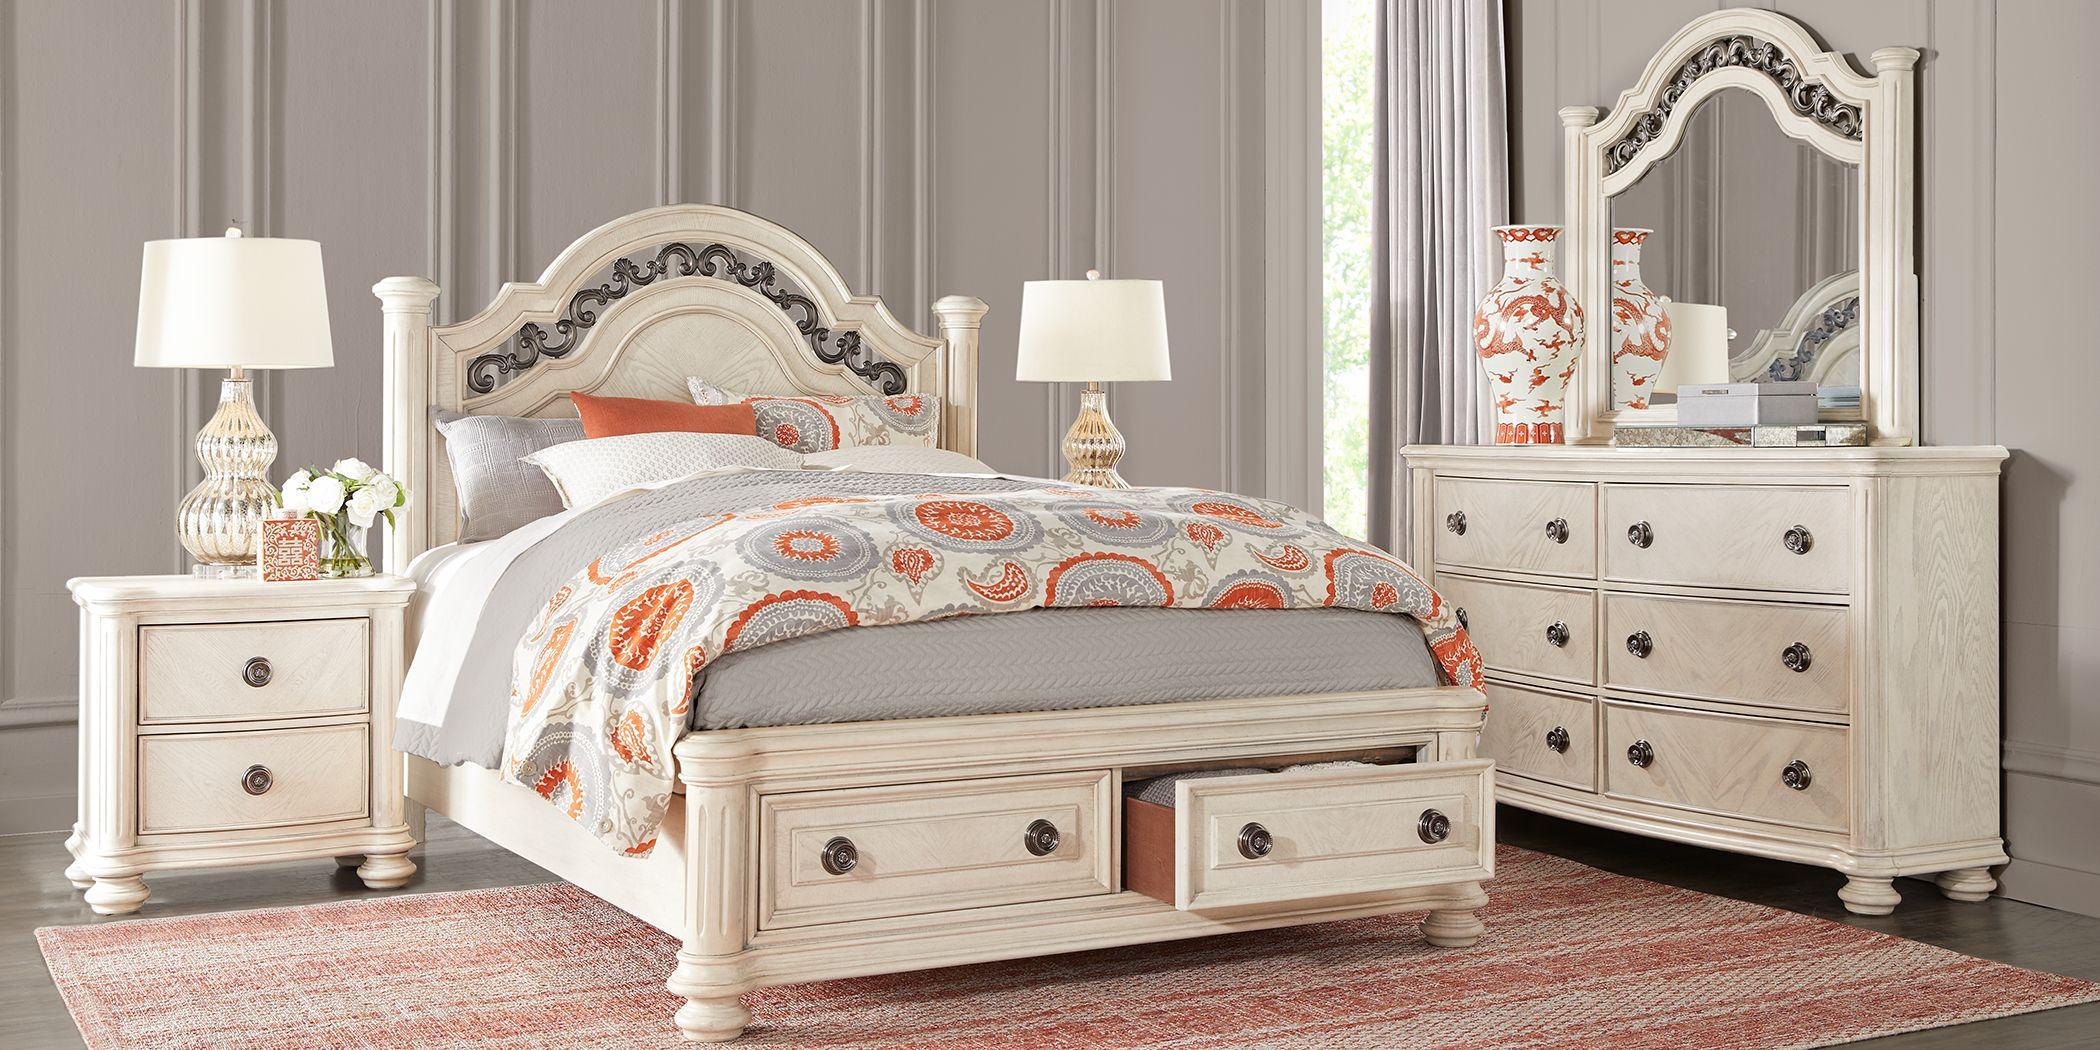 Anastasia White 5 Pc Queen Panel Bedroom with Storage